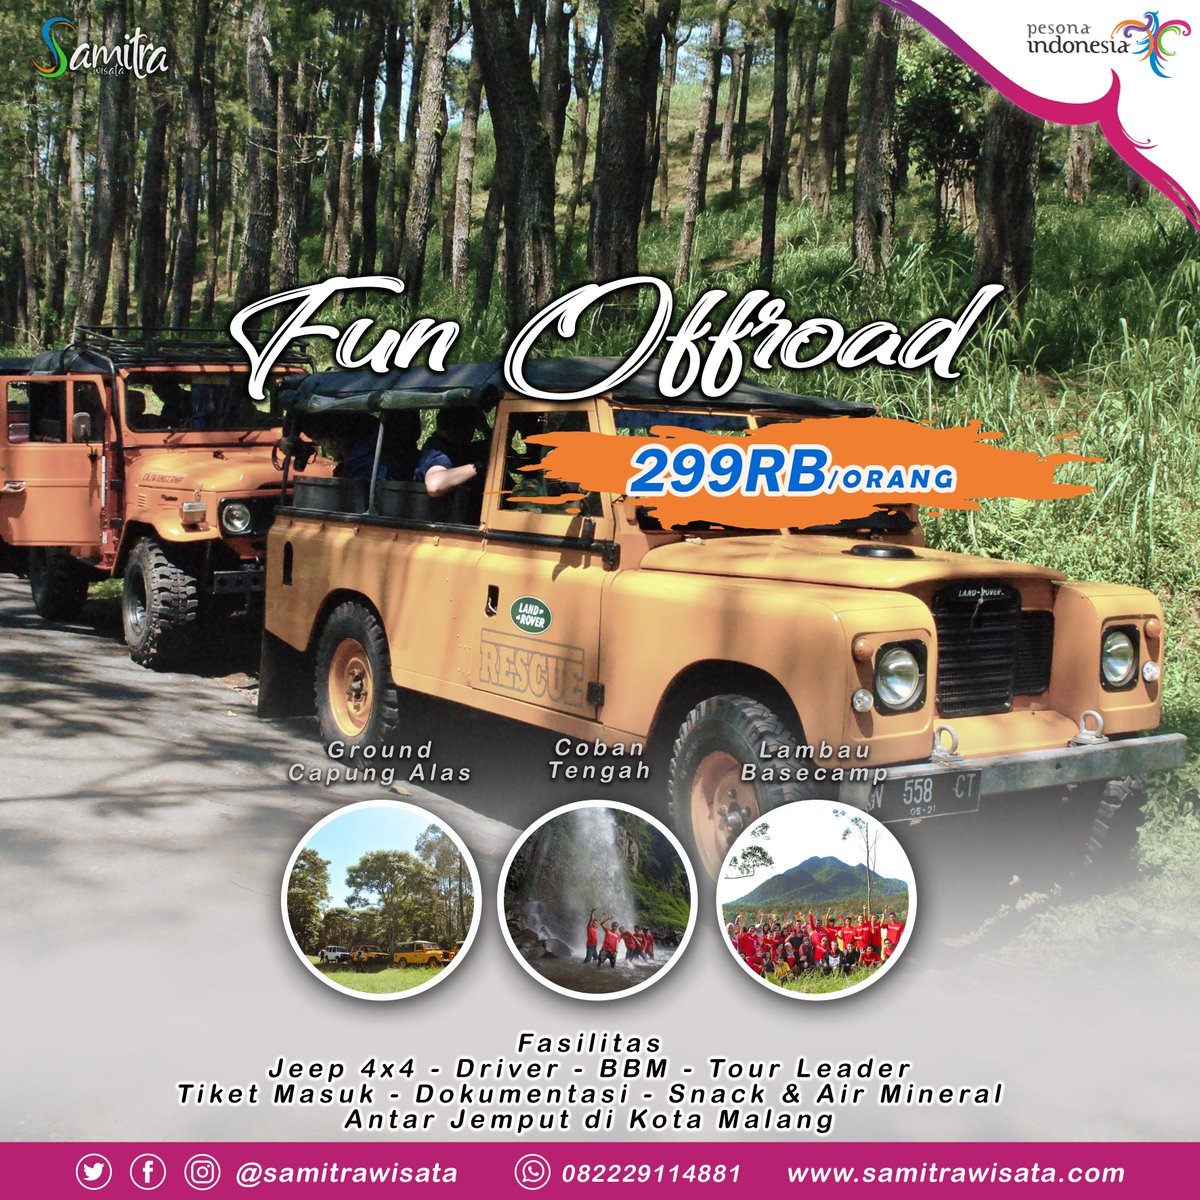 Lets #funoffroad #offroadkotabatu #offroadadventure #outingkotabatu #outdooractivity #outingkantor pic.twitter.com/ICh5qLTXCo